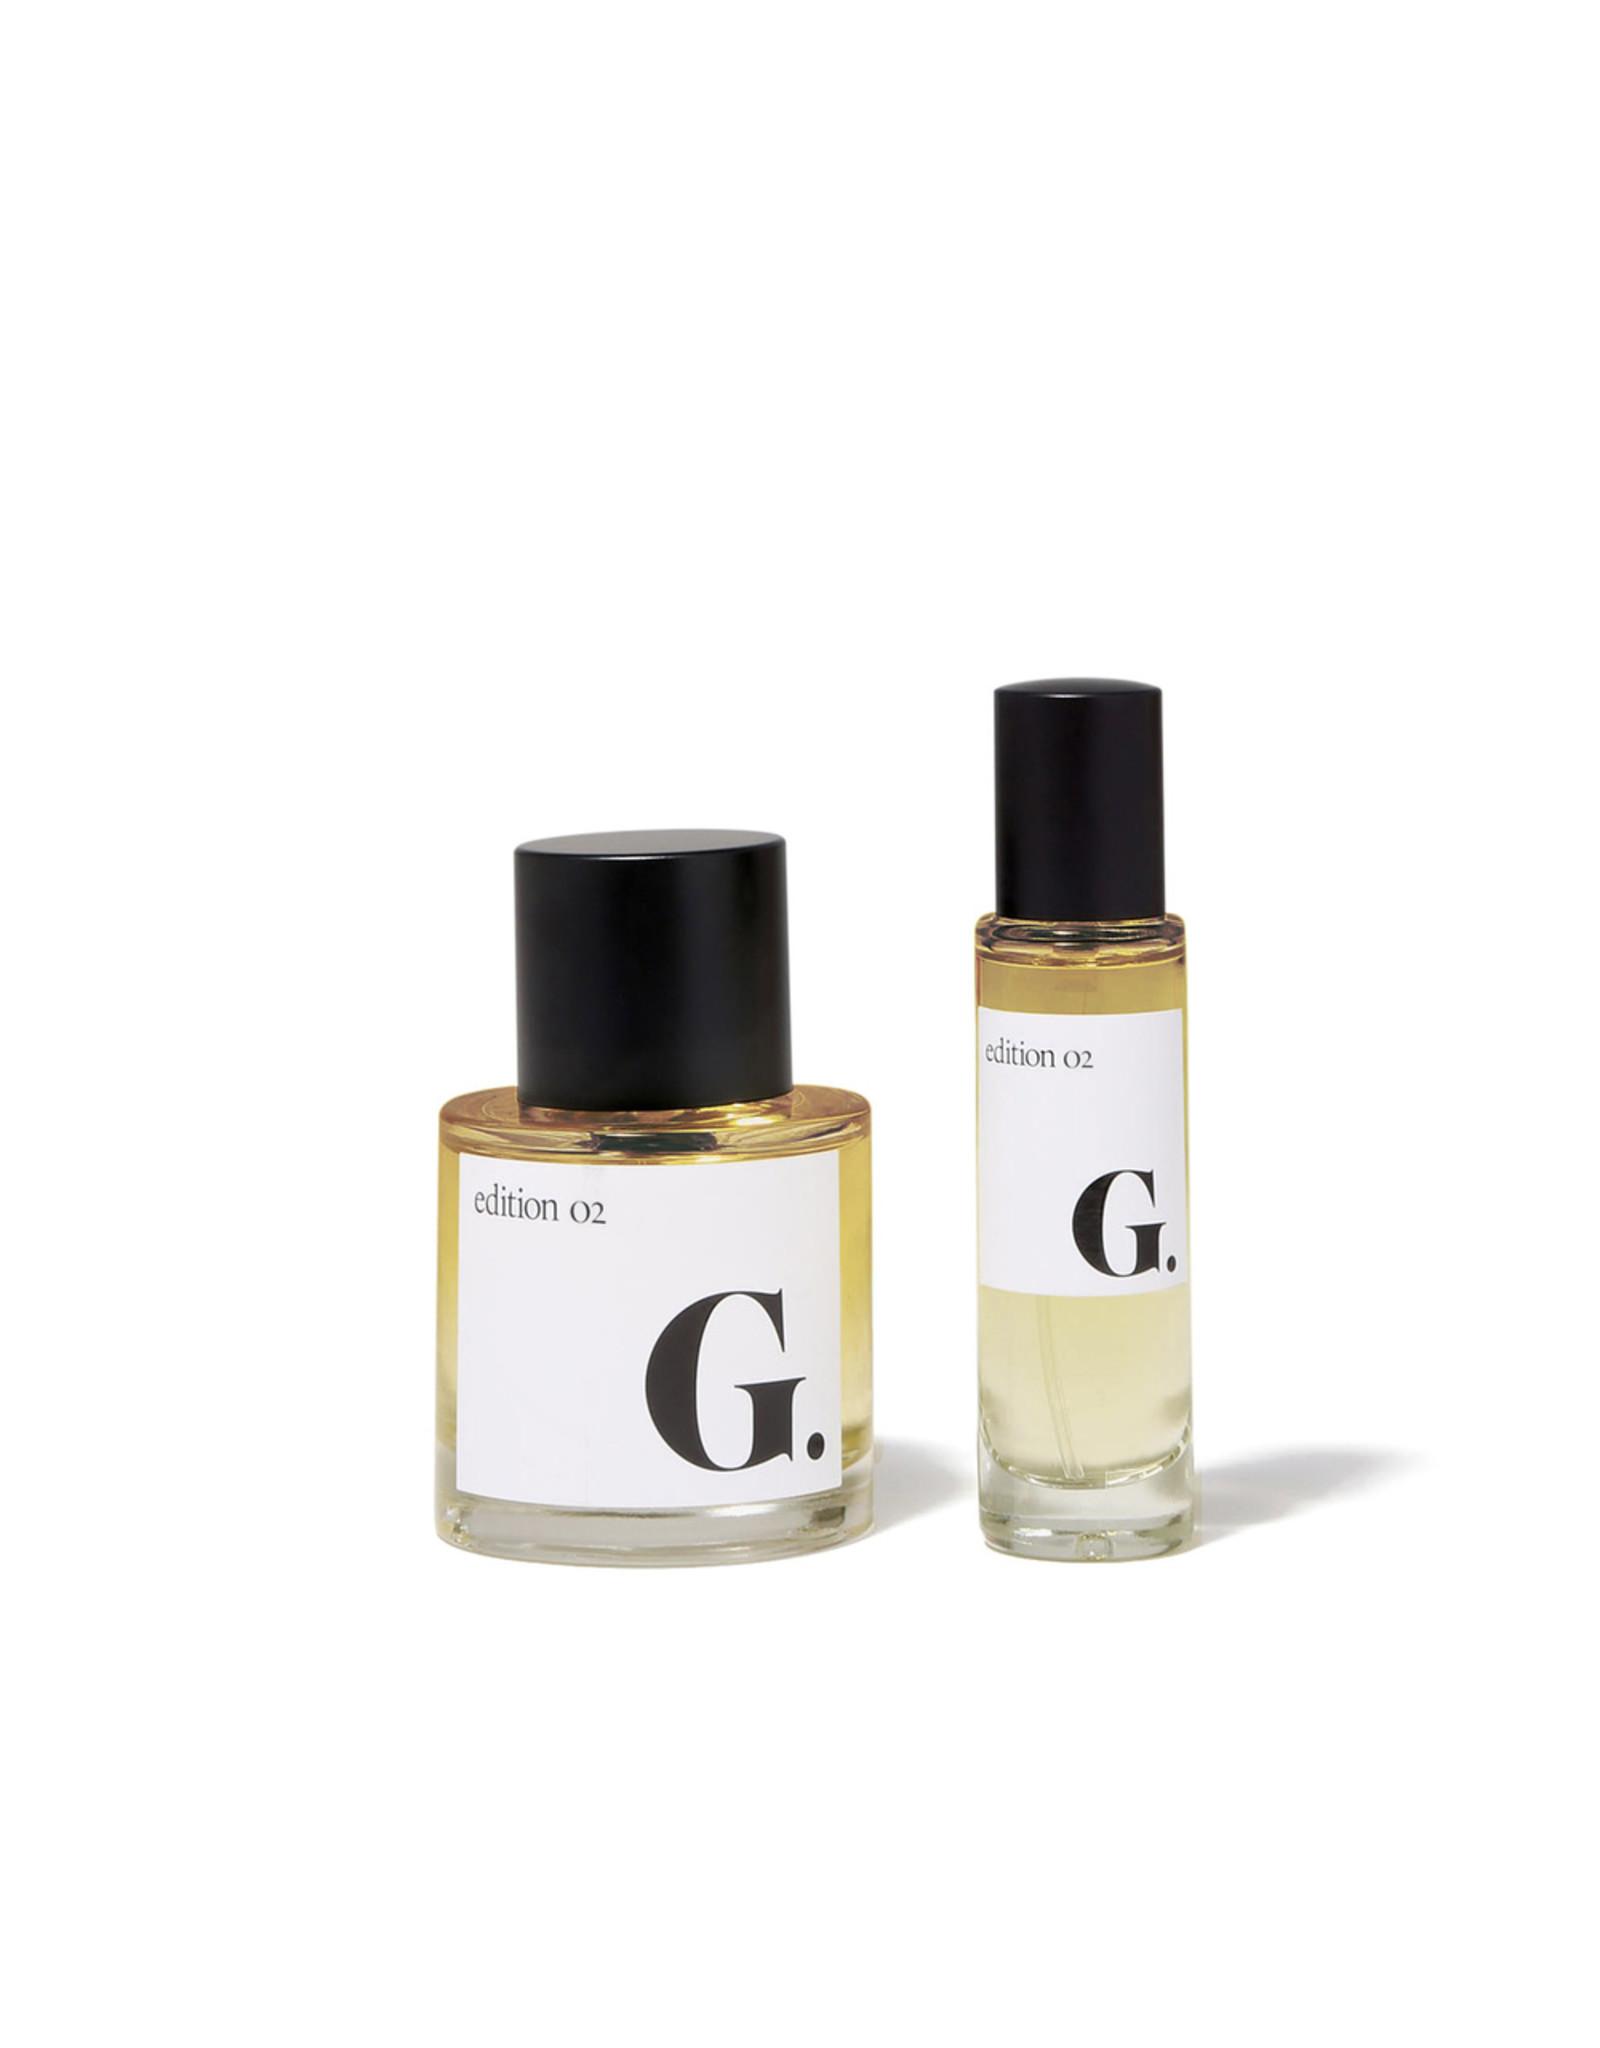 goop Beauty goop Beauty Eau De Parfum: Edition 02 - Shiso - 0.5 fl oz